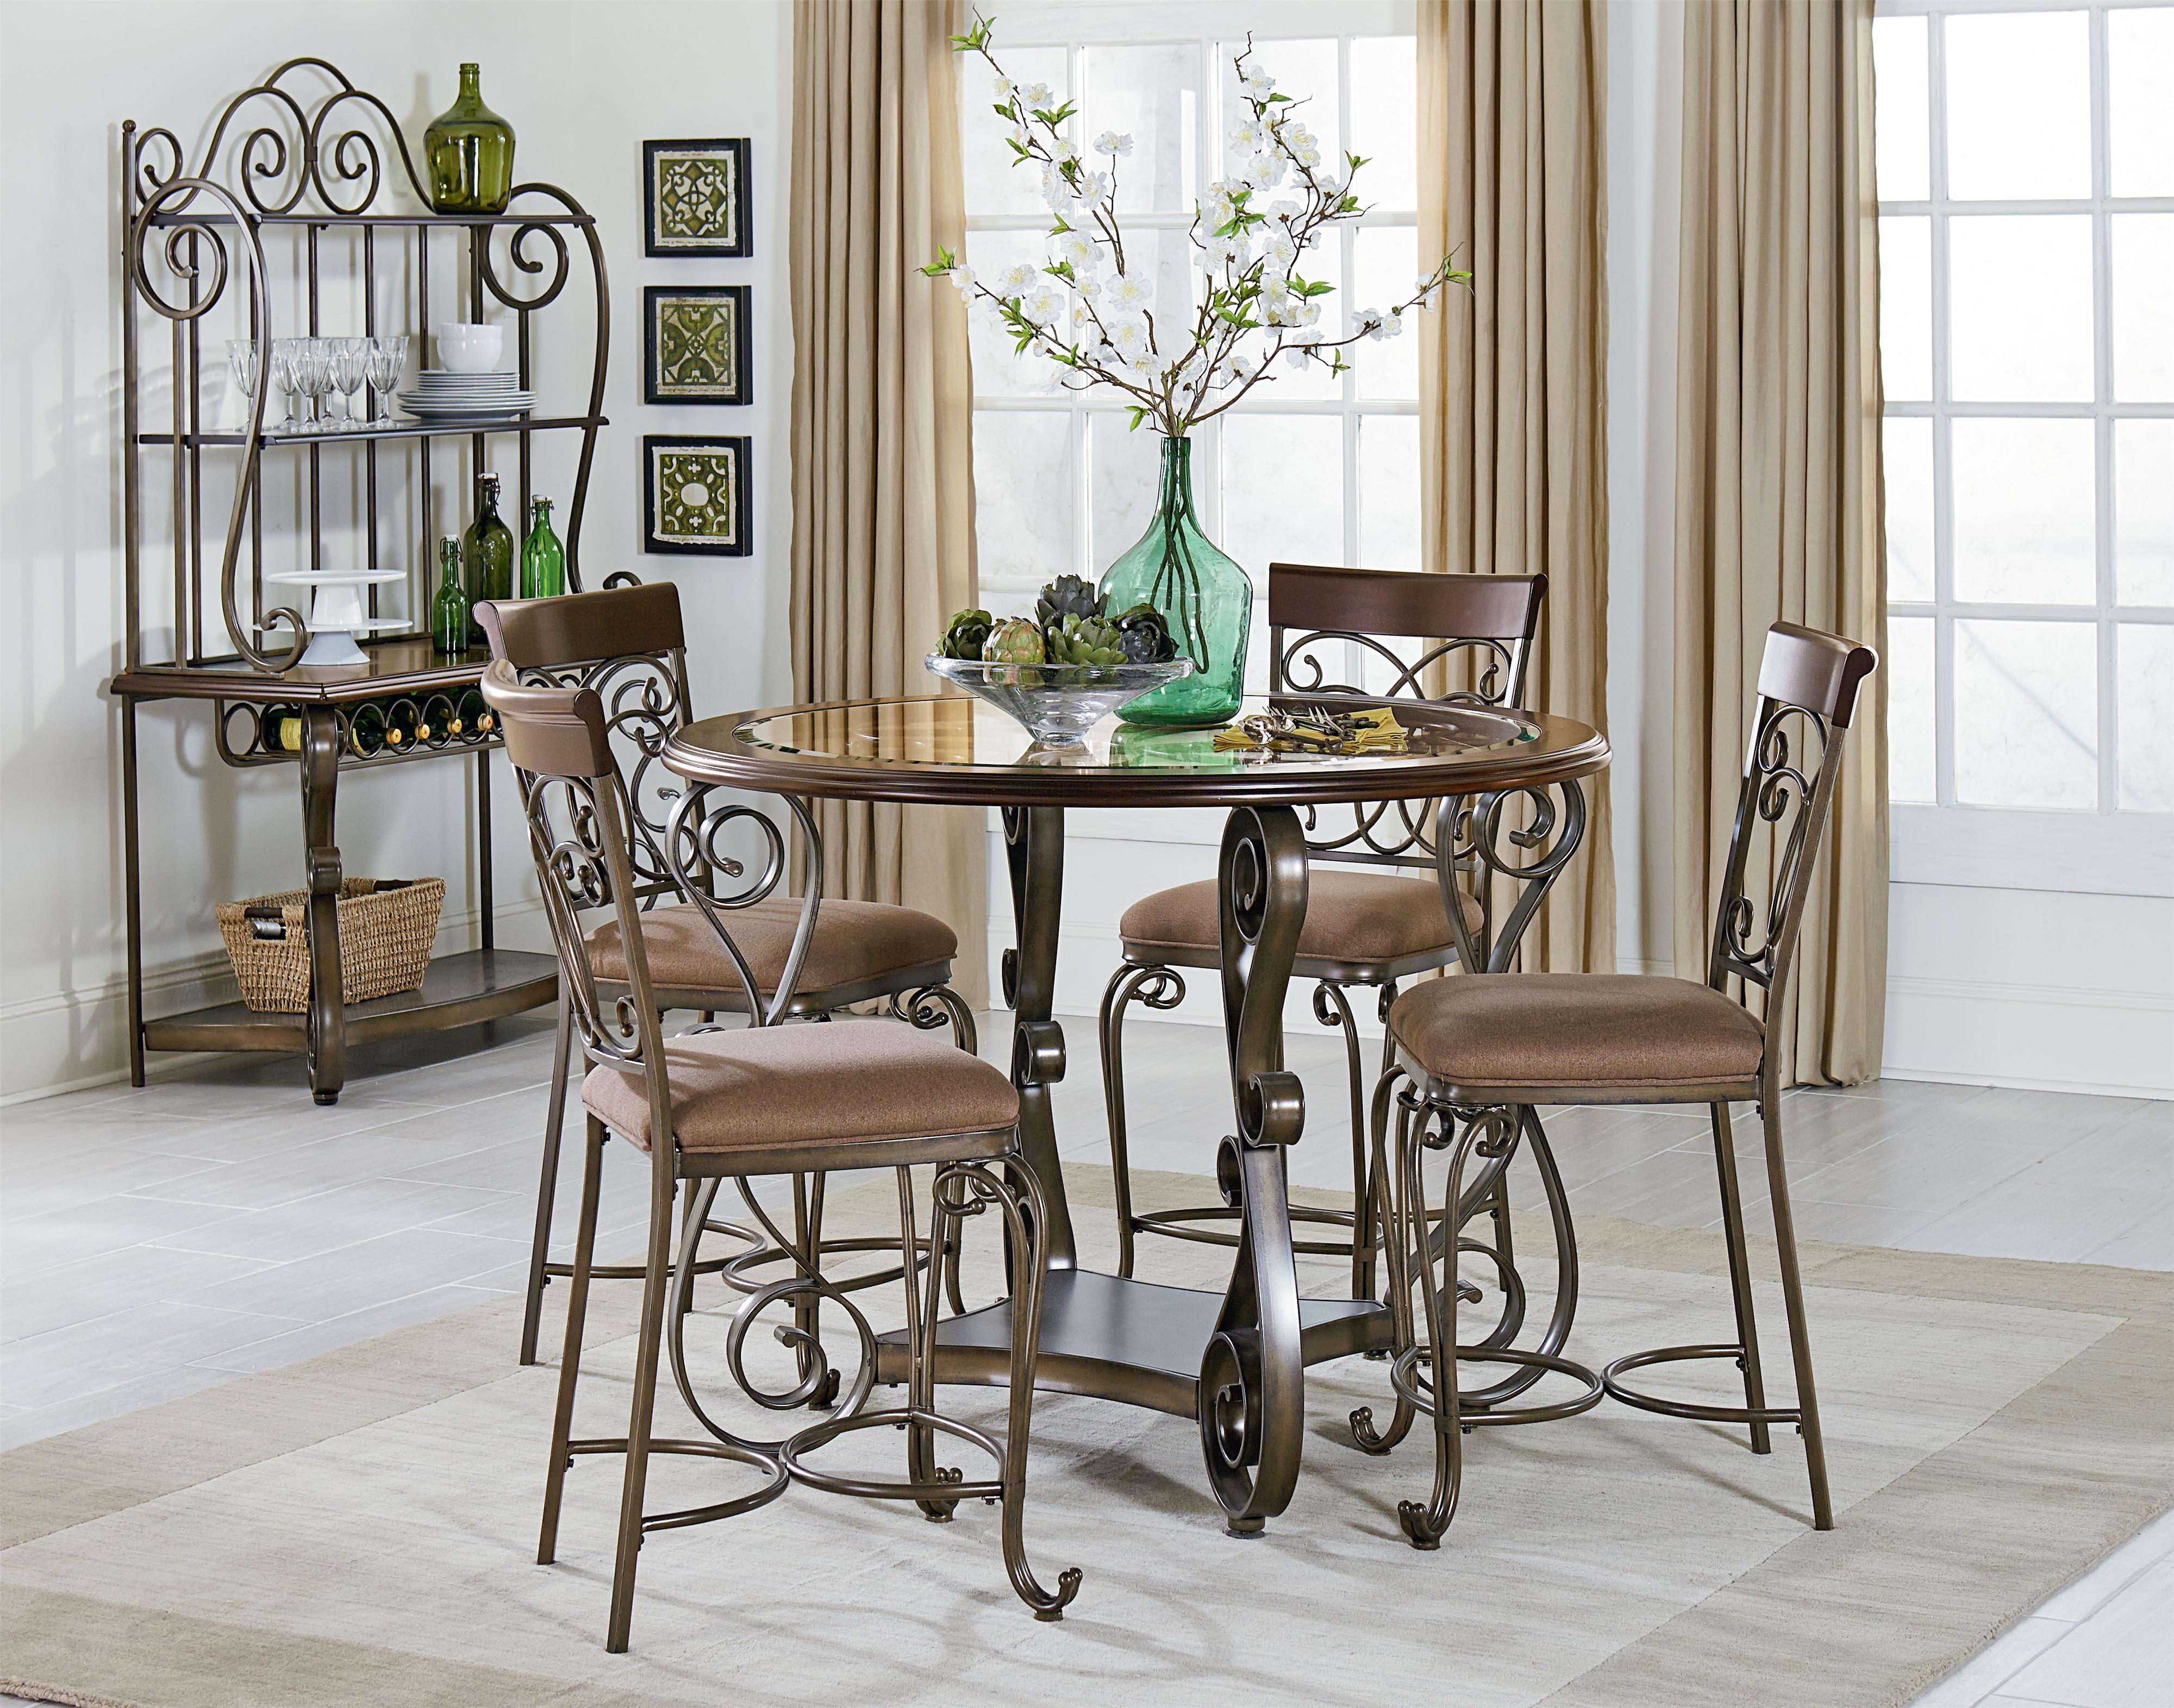 standard furniture bombay casual dining room group. Black Bedroom Furniture Sets. Home Design Ideas